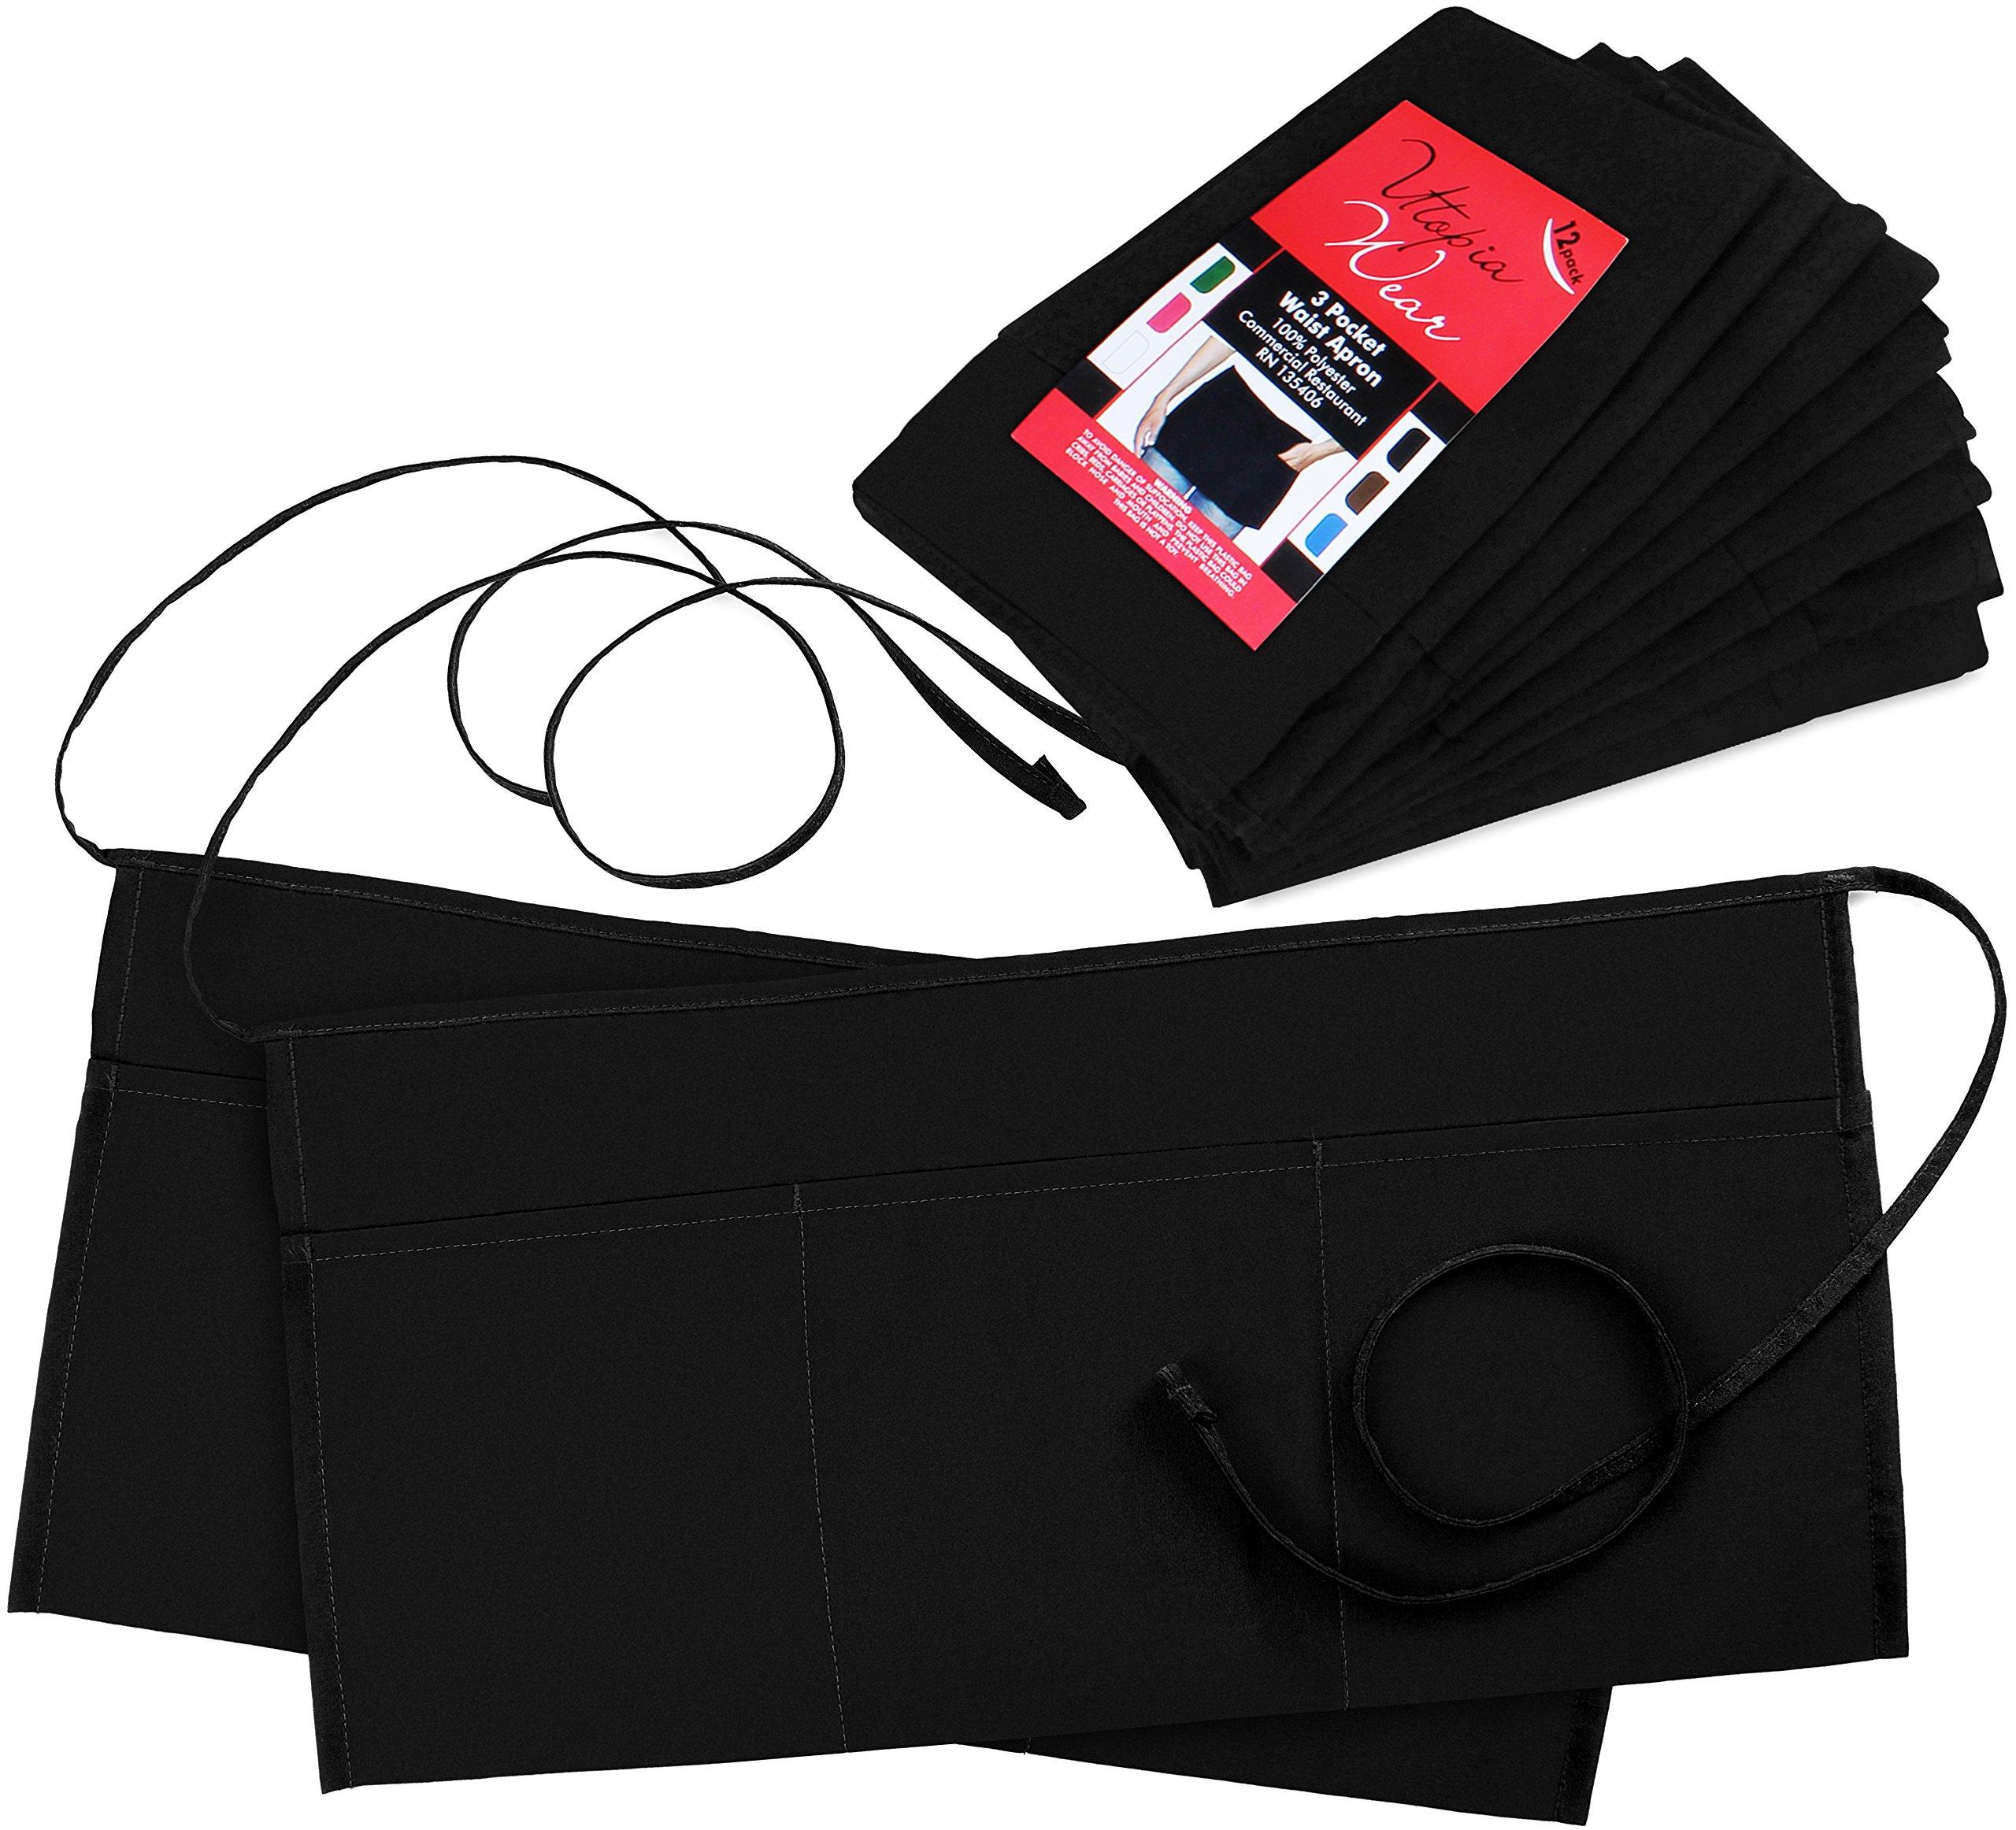 Utopia Wear 3 Pockets Waist Apron (Set of 12, Black, 24 x 12 inches) - Restaurant Half Aprons, Bartender Apron, Money Apron, Check Holder